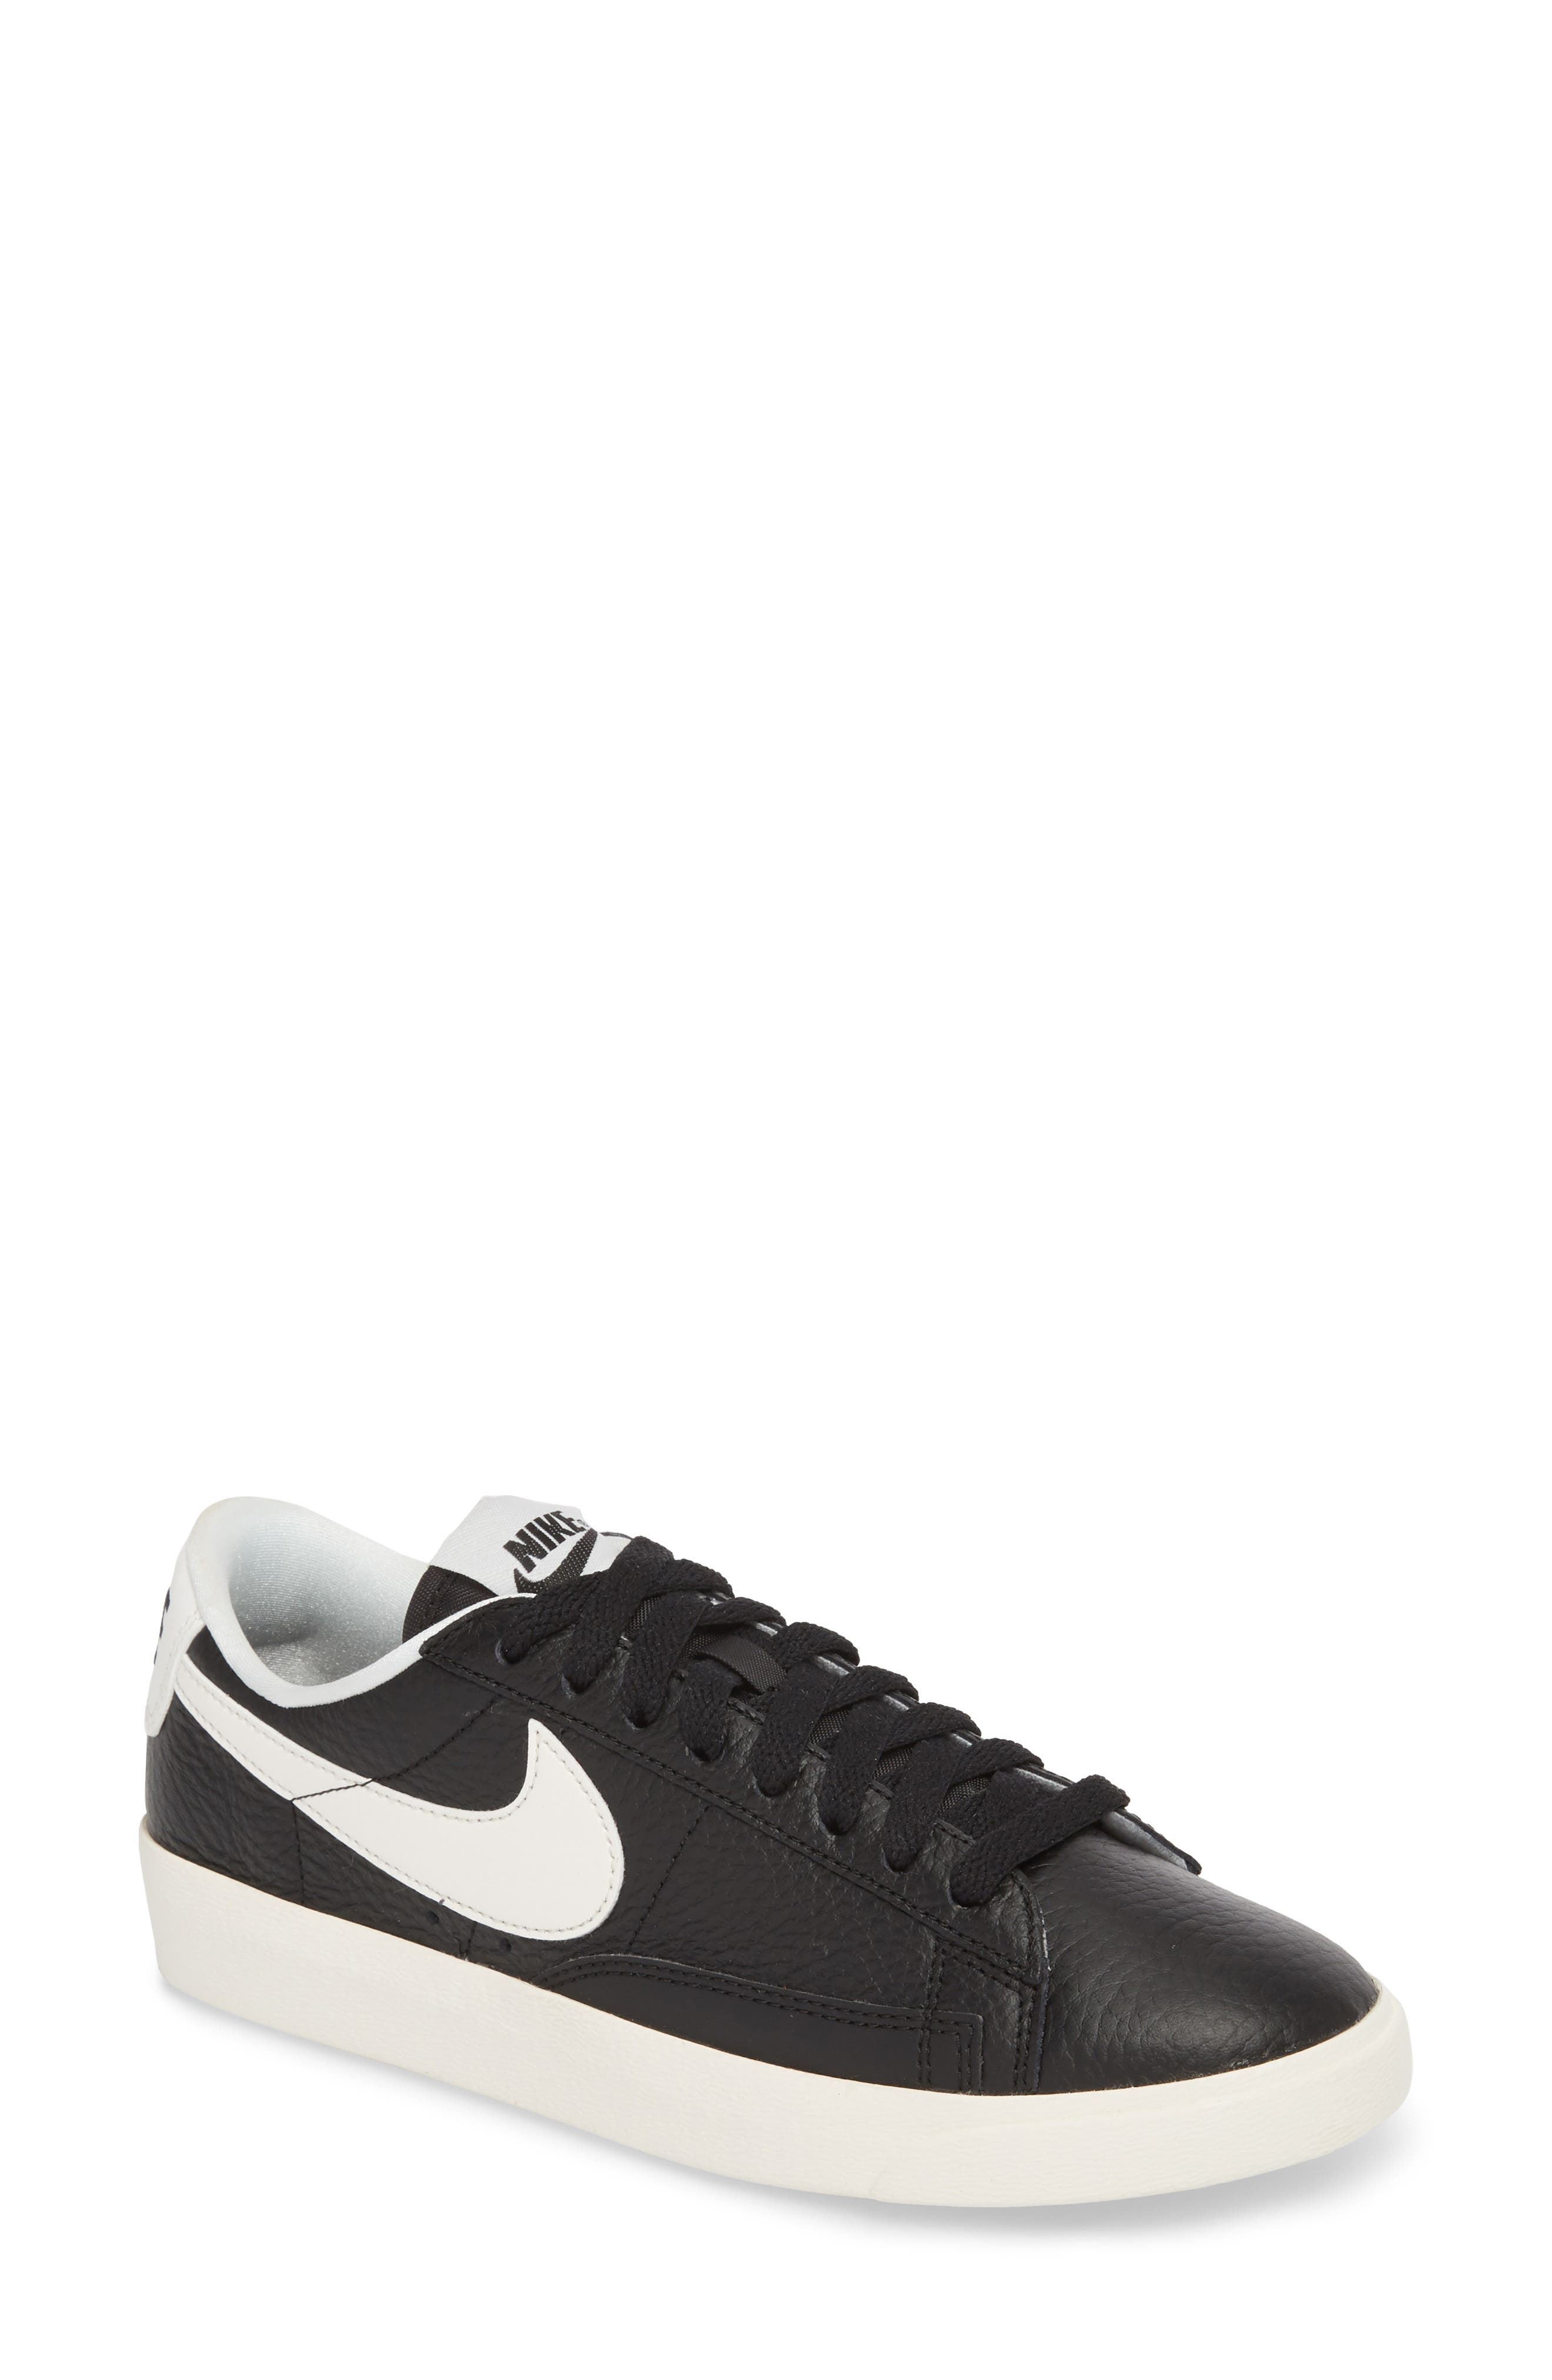 Blazer Premium Low Sneaker,                             Main thumbnail 1, color,                             004